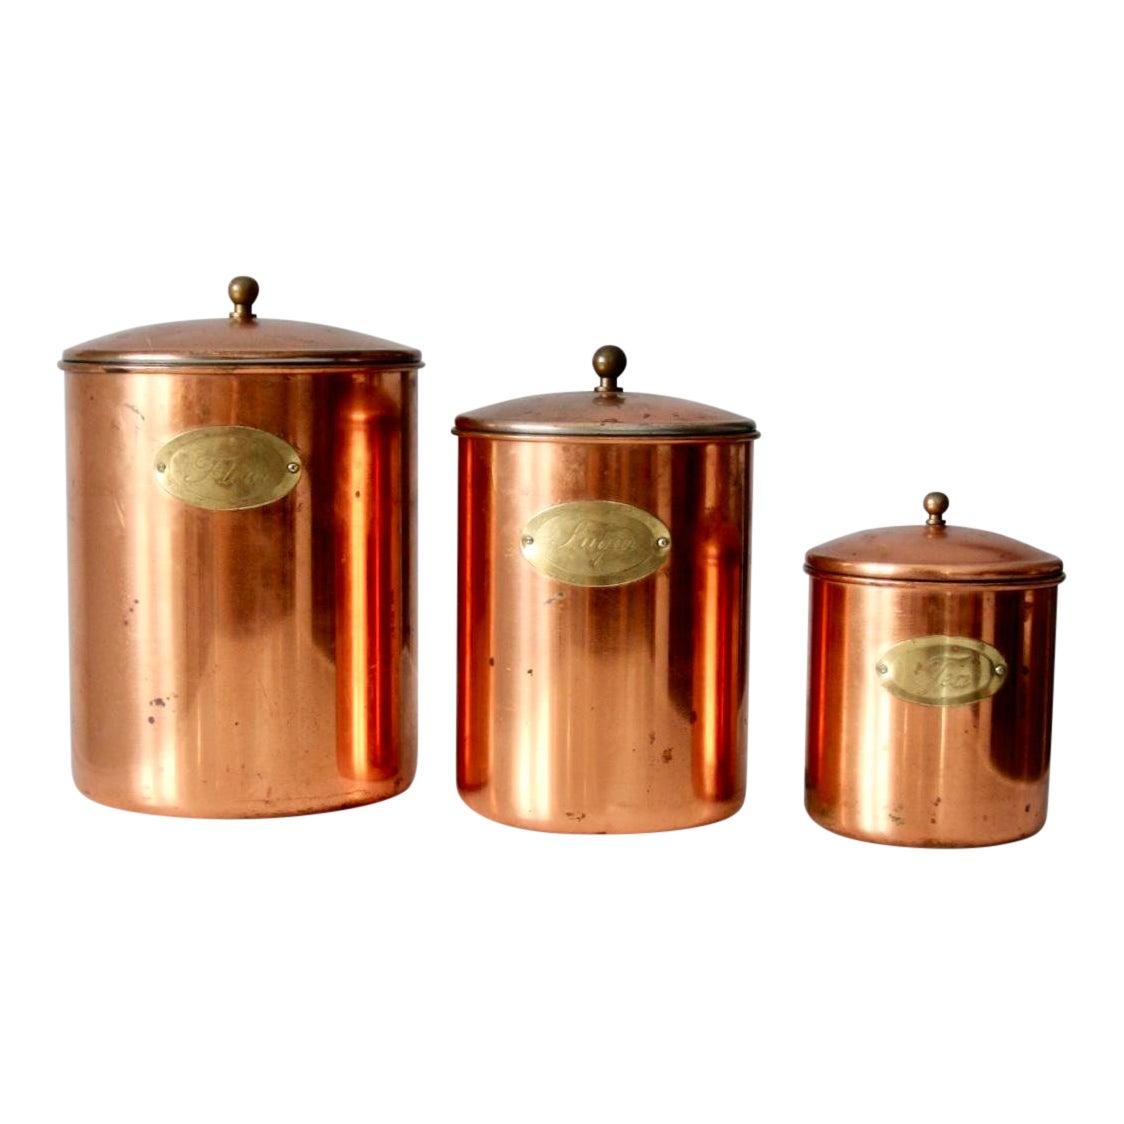 Vintage Copper Kitchen Canisters Set of 3